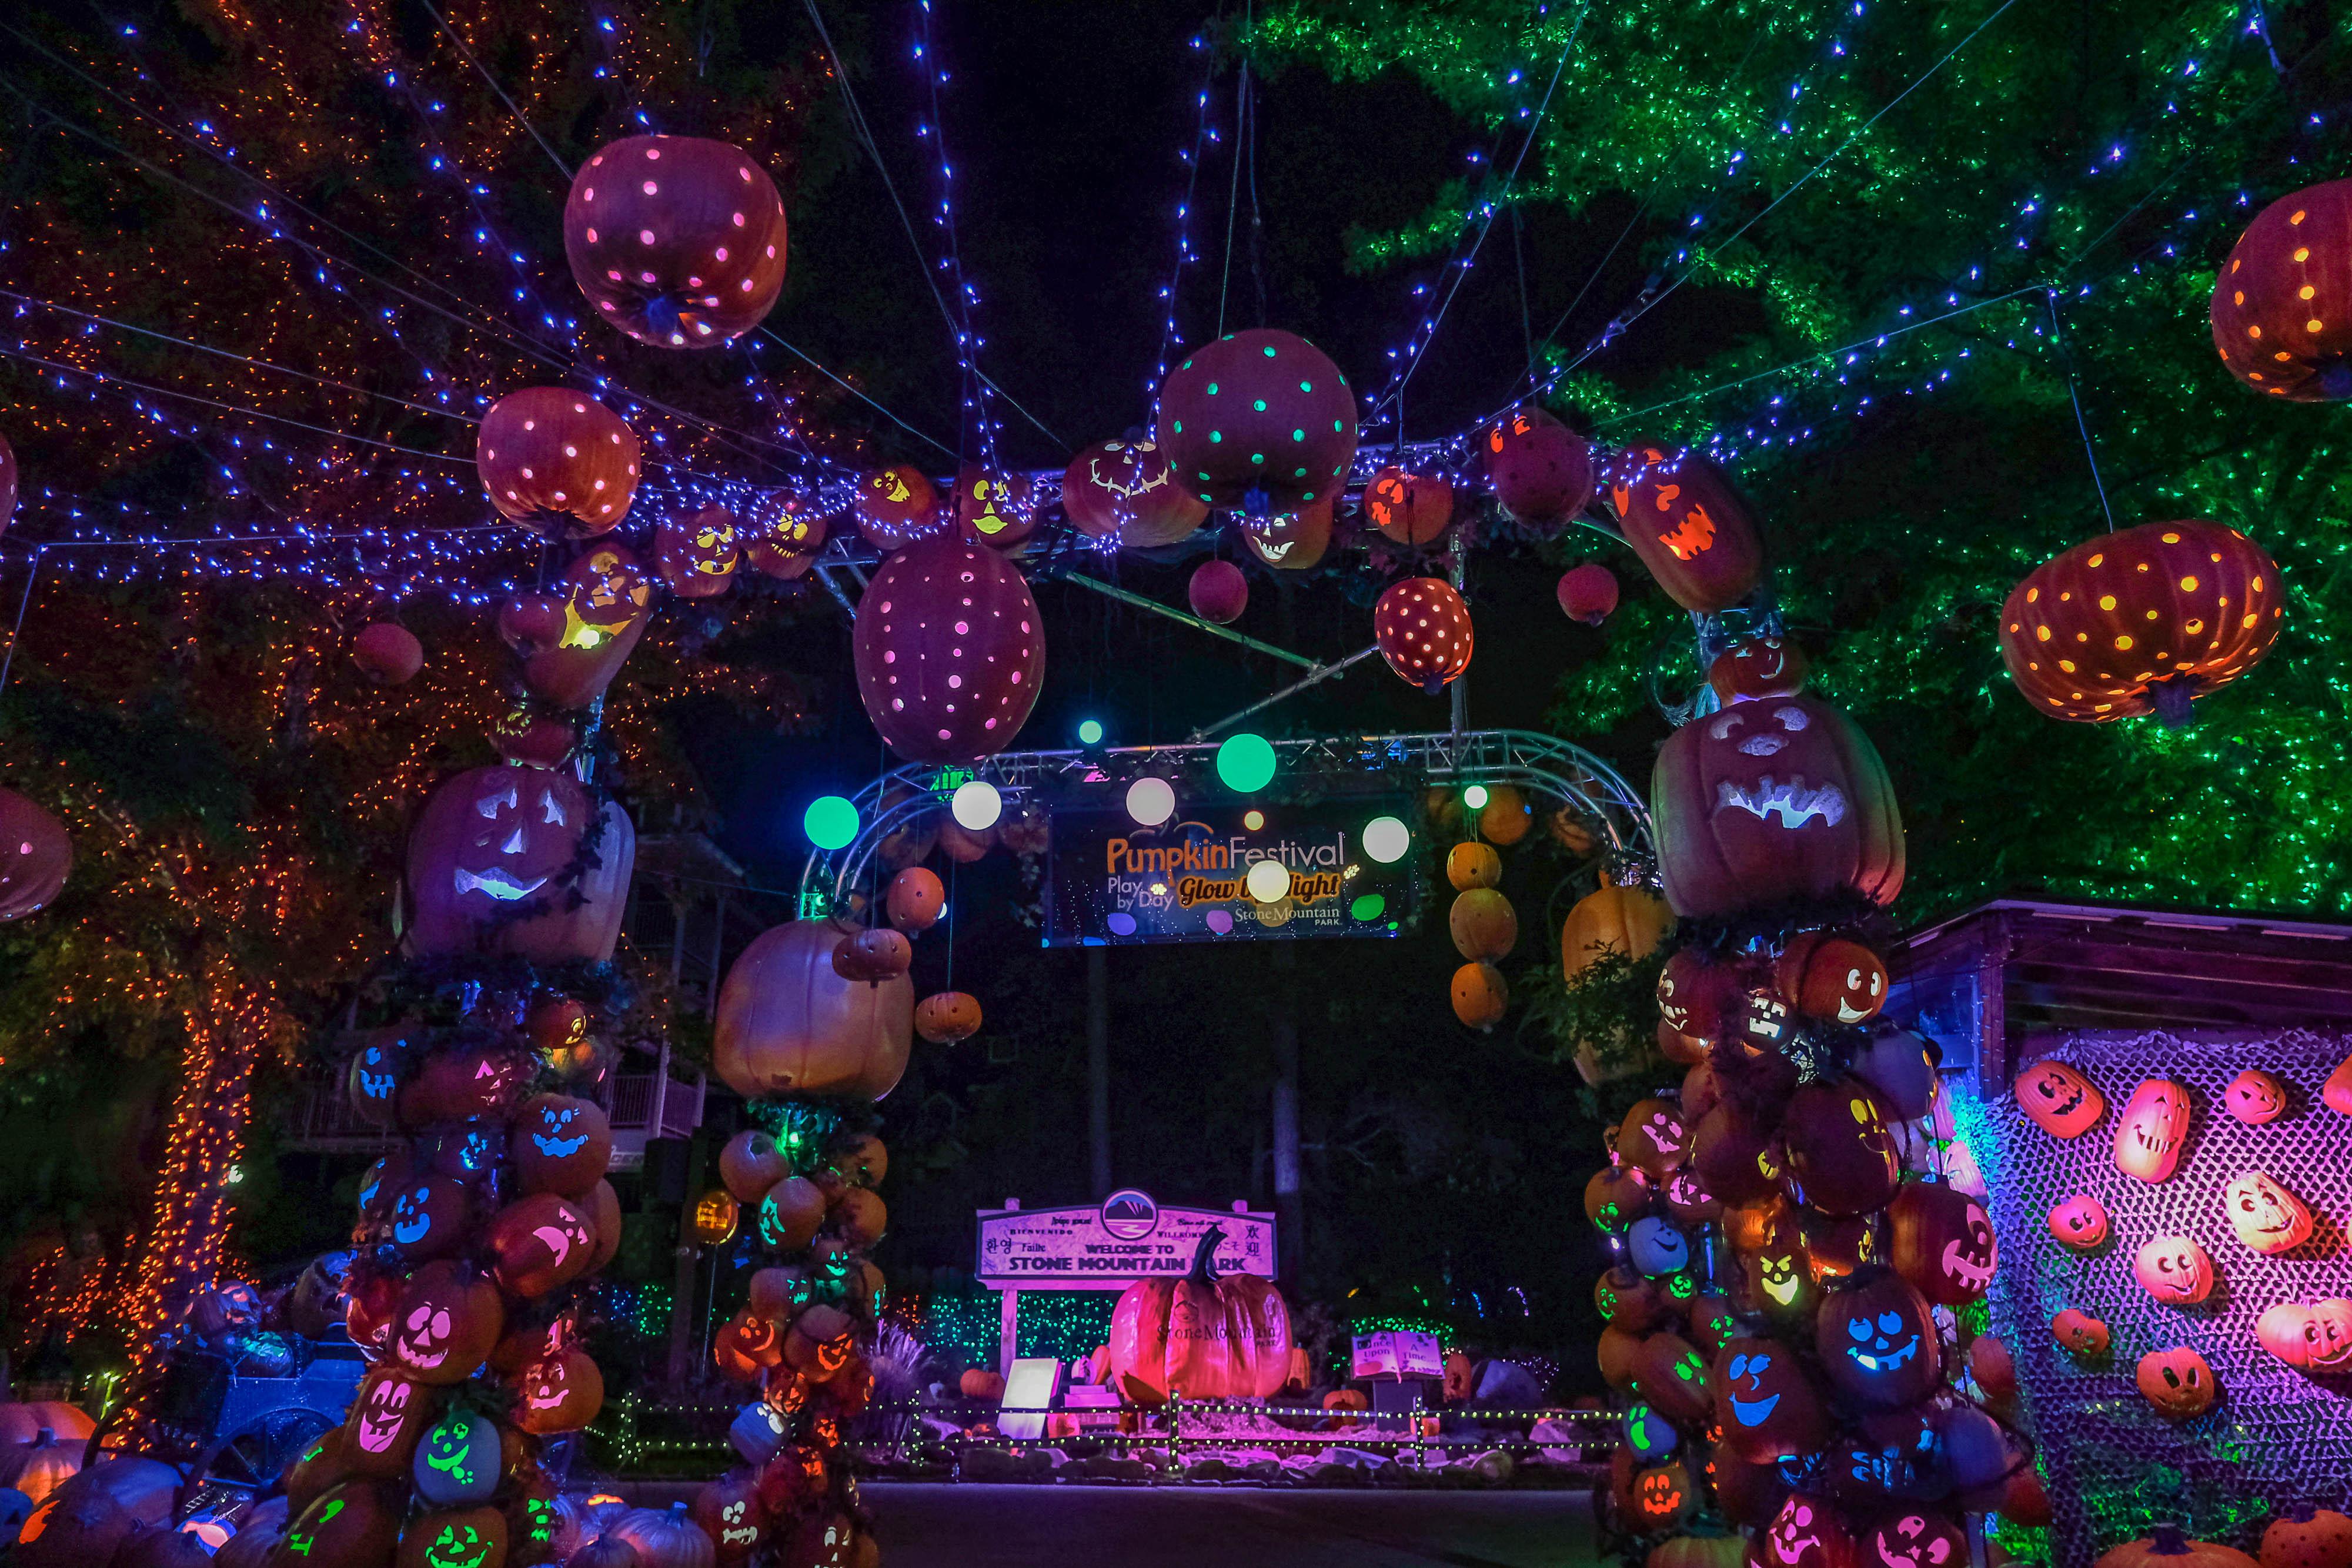 Stone Mountain Pumpkin Festival - Madeline Mulkey (SMP Marketing)